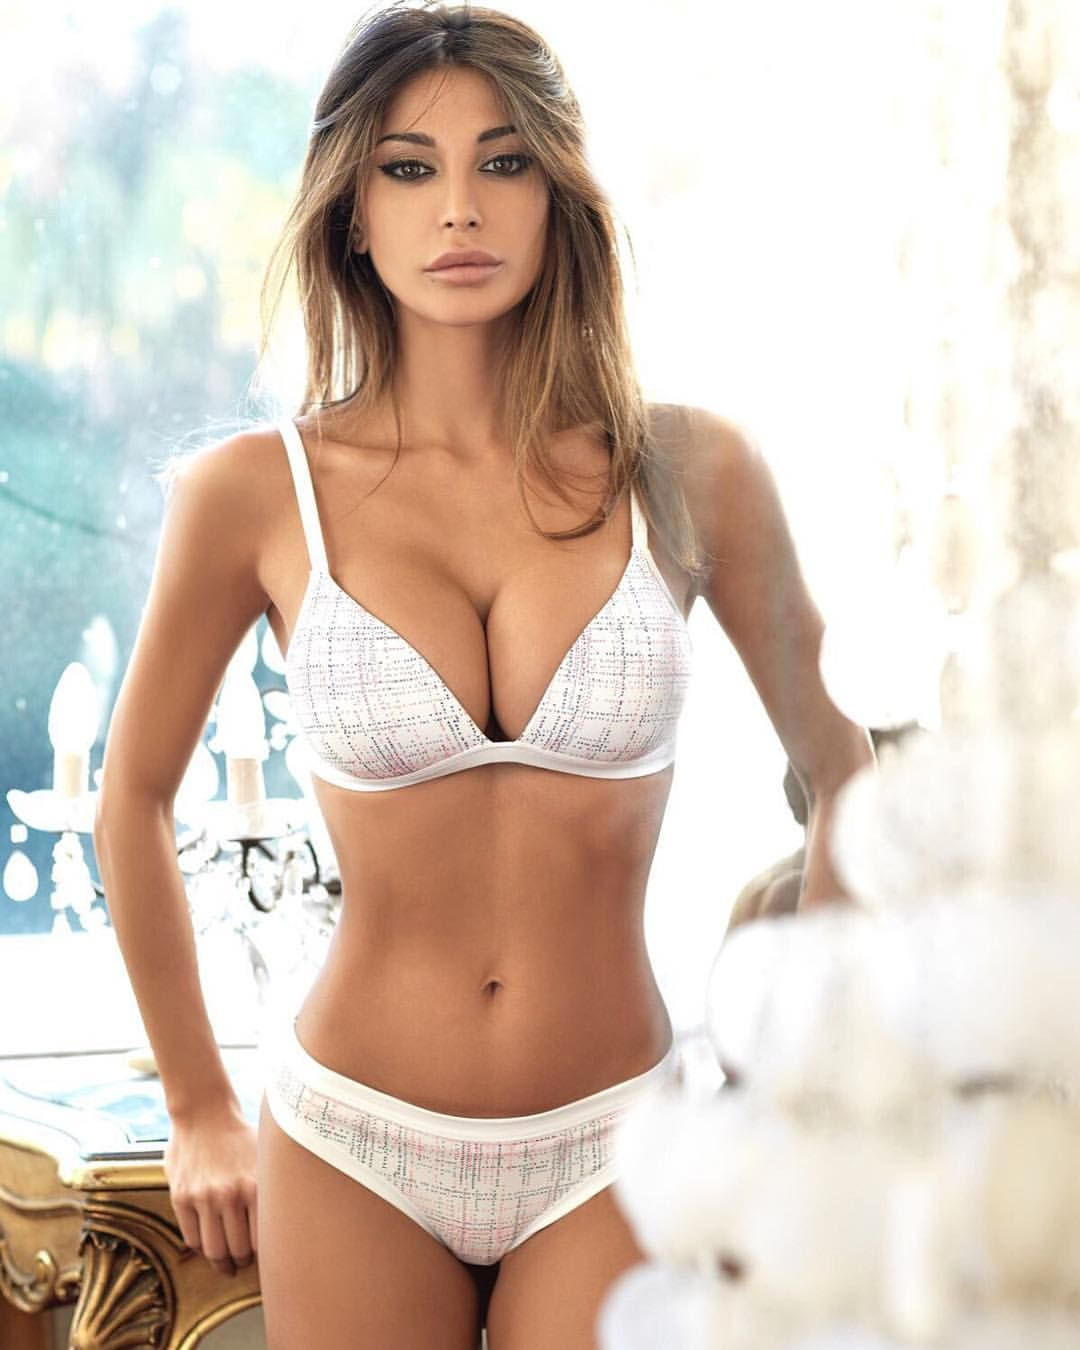 Cleavage Cristina Buccino nude (13 photo), Sexy, Cleavage, Boobs, butt 2017